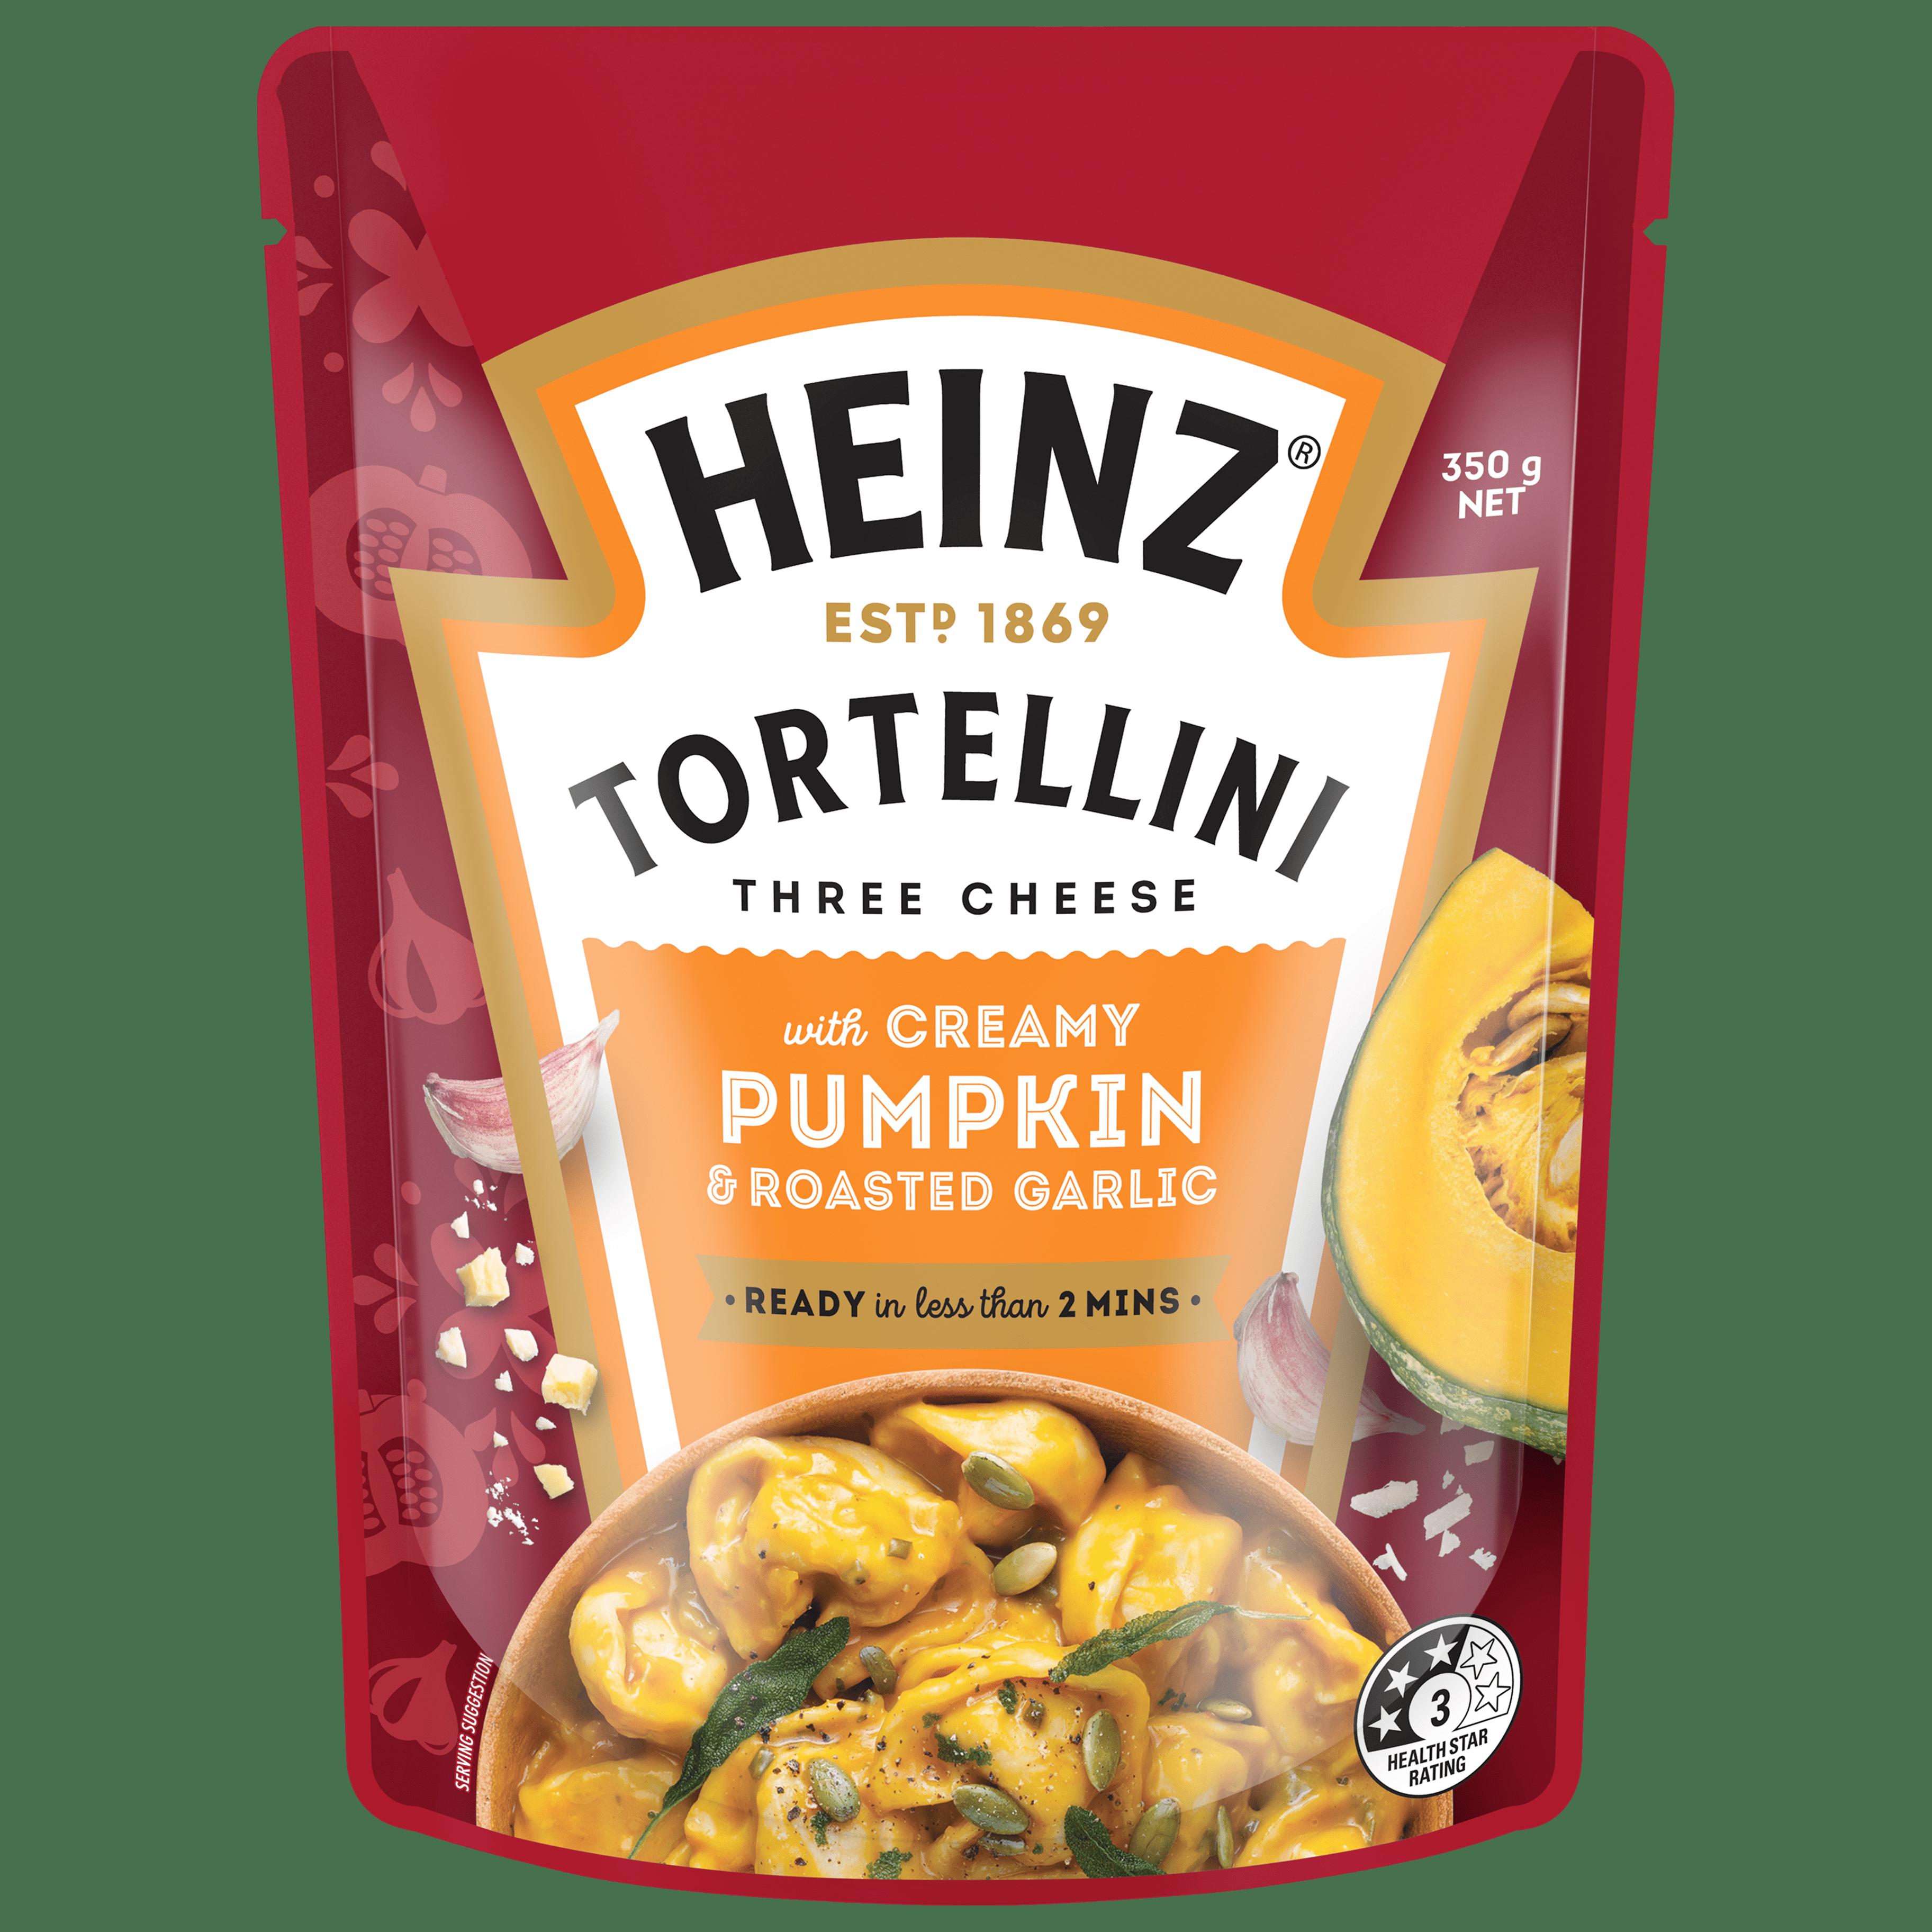 TORTELLINI CREAMY PUMPKIN